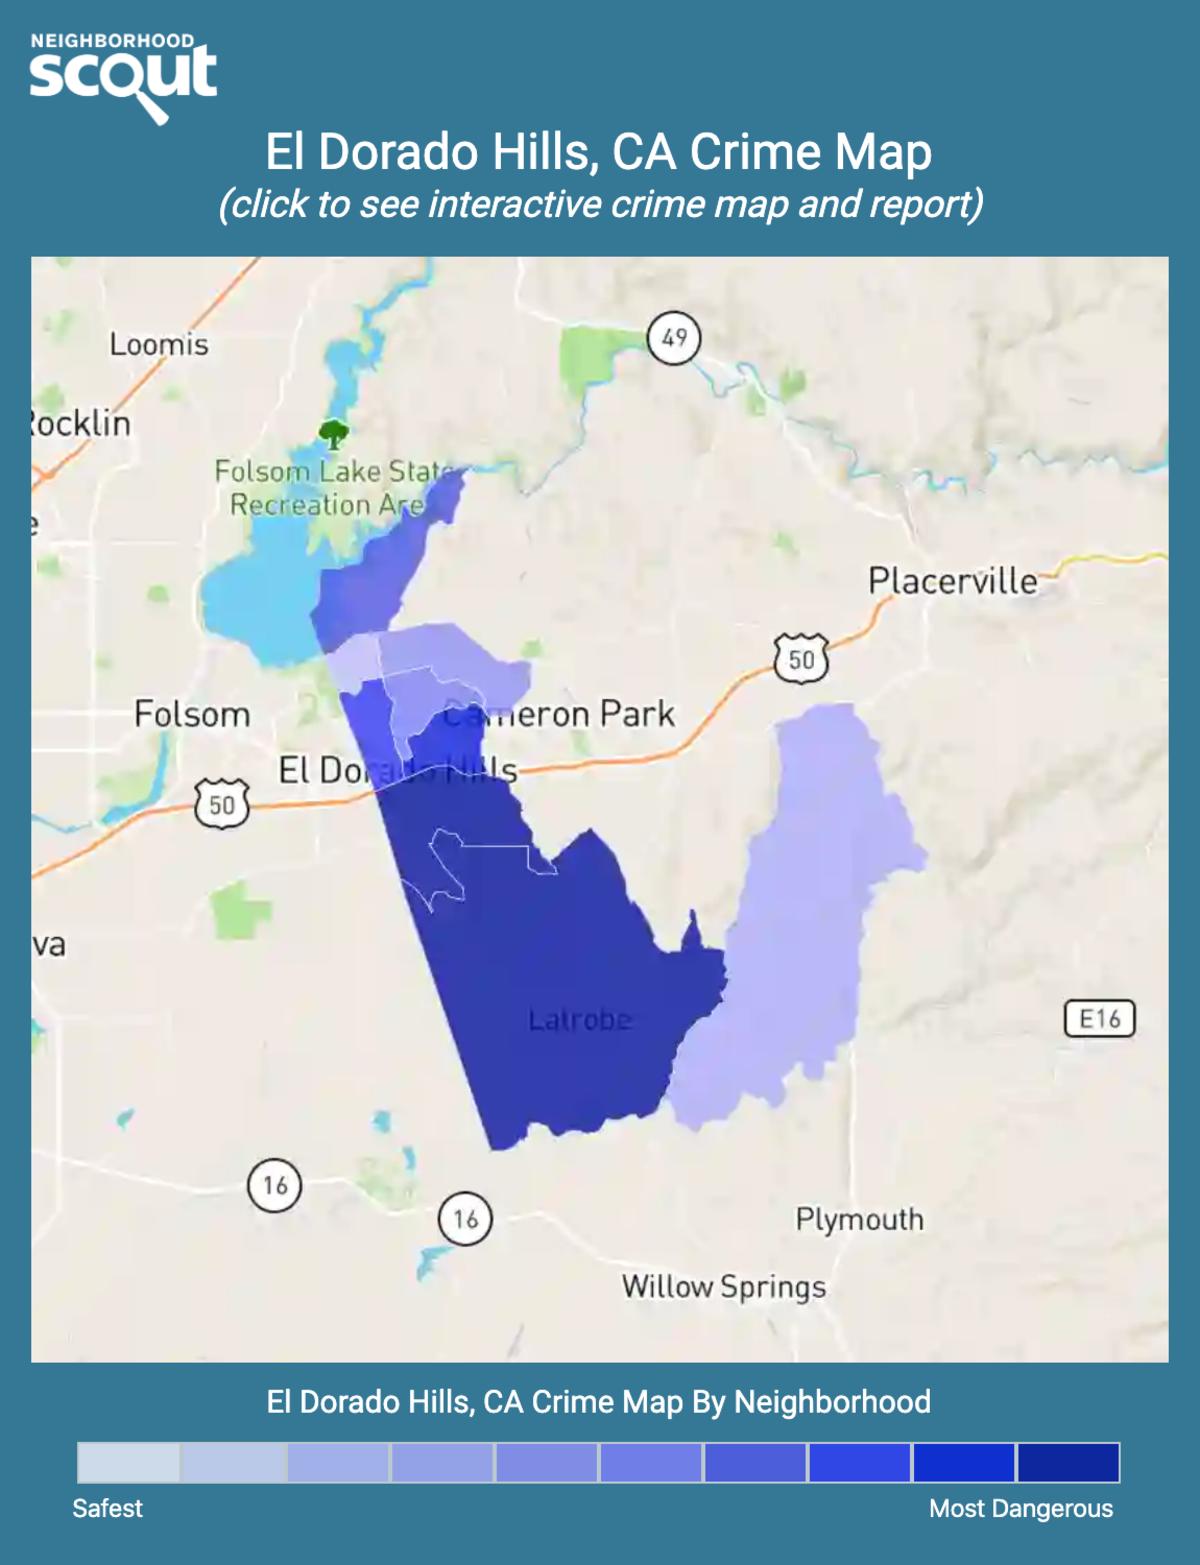 El Dorado Hills, California crime map